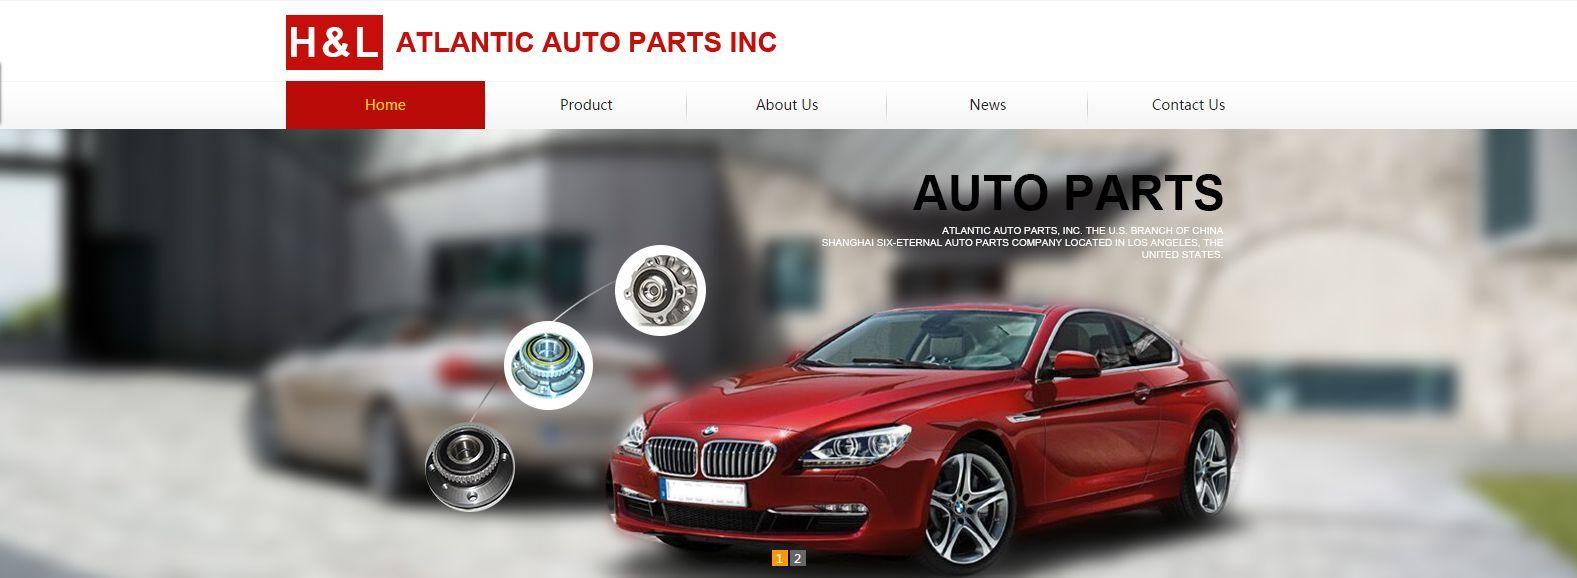 Atlantic Auto Parts